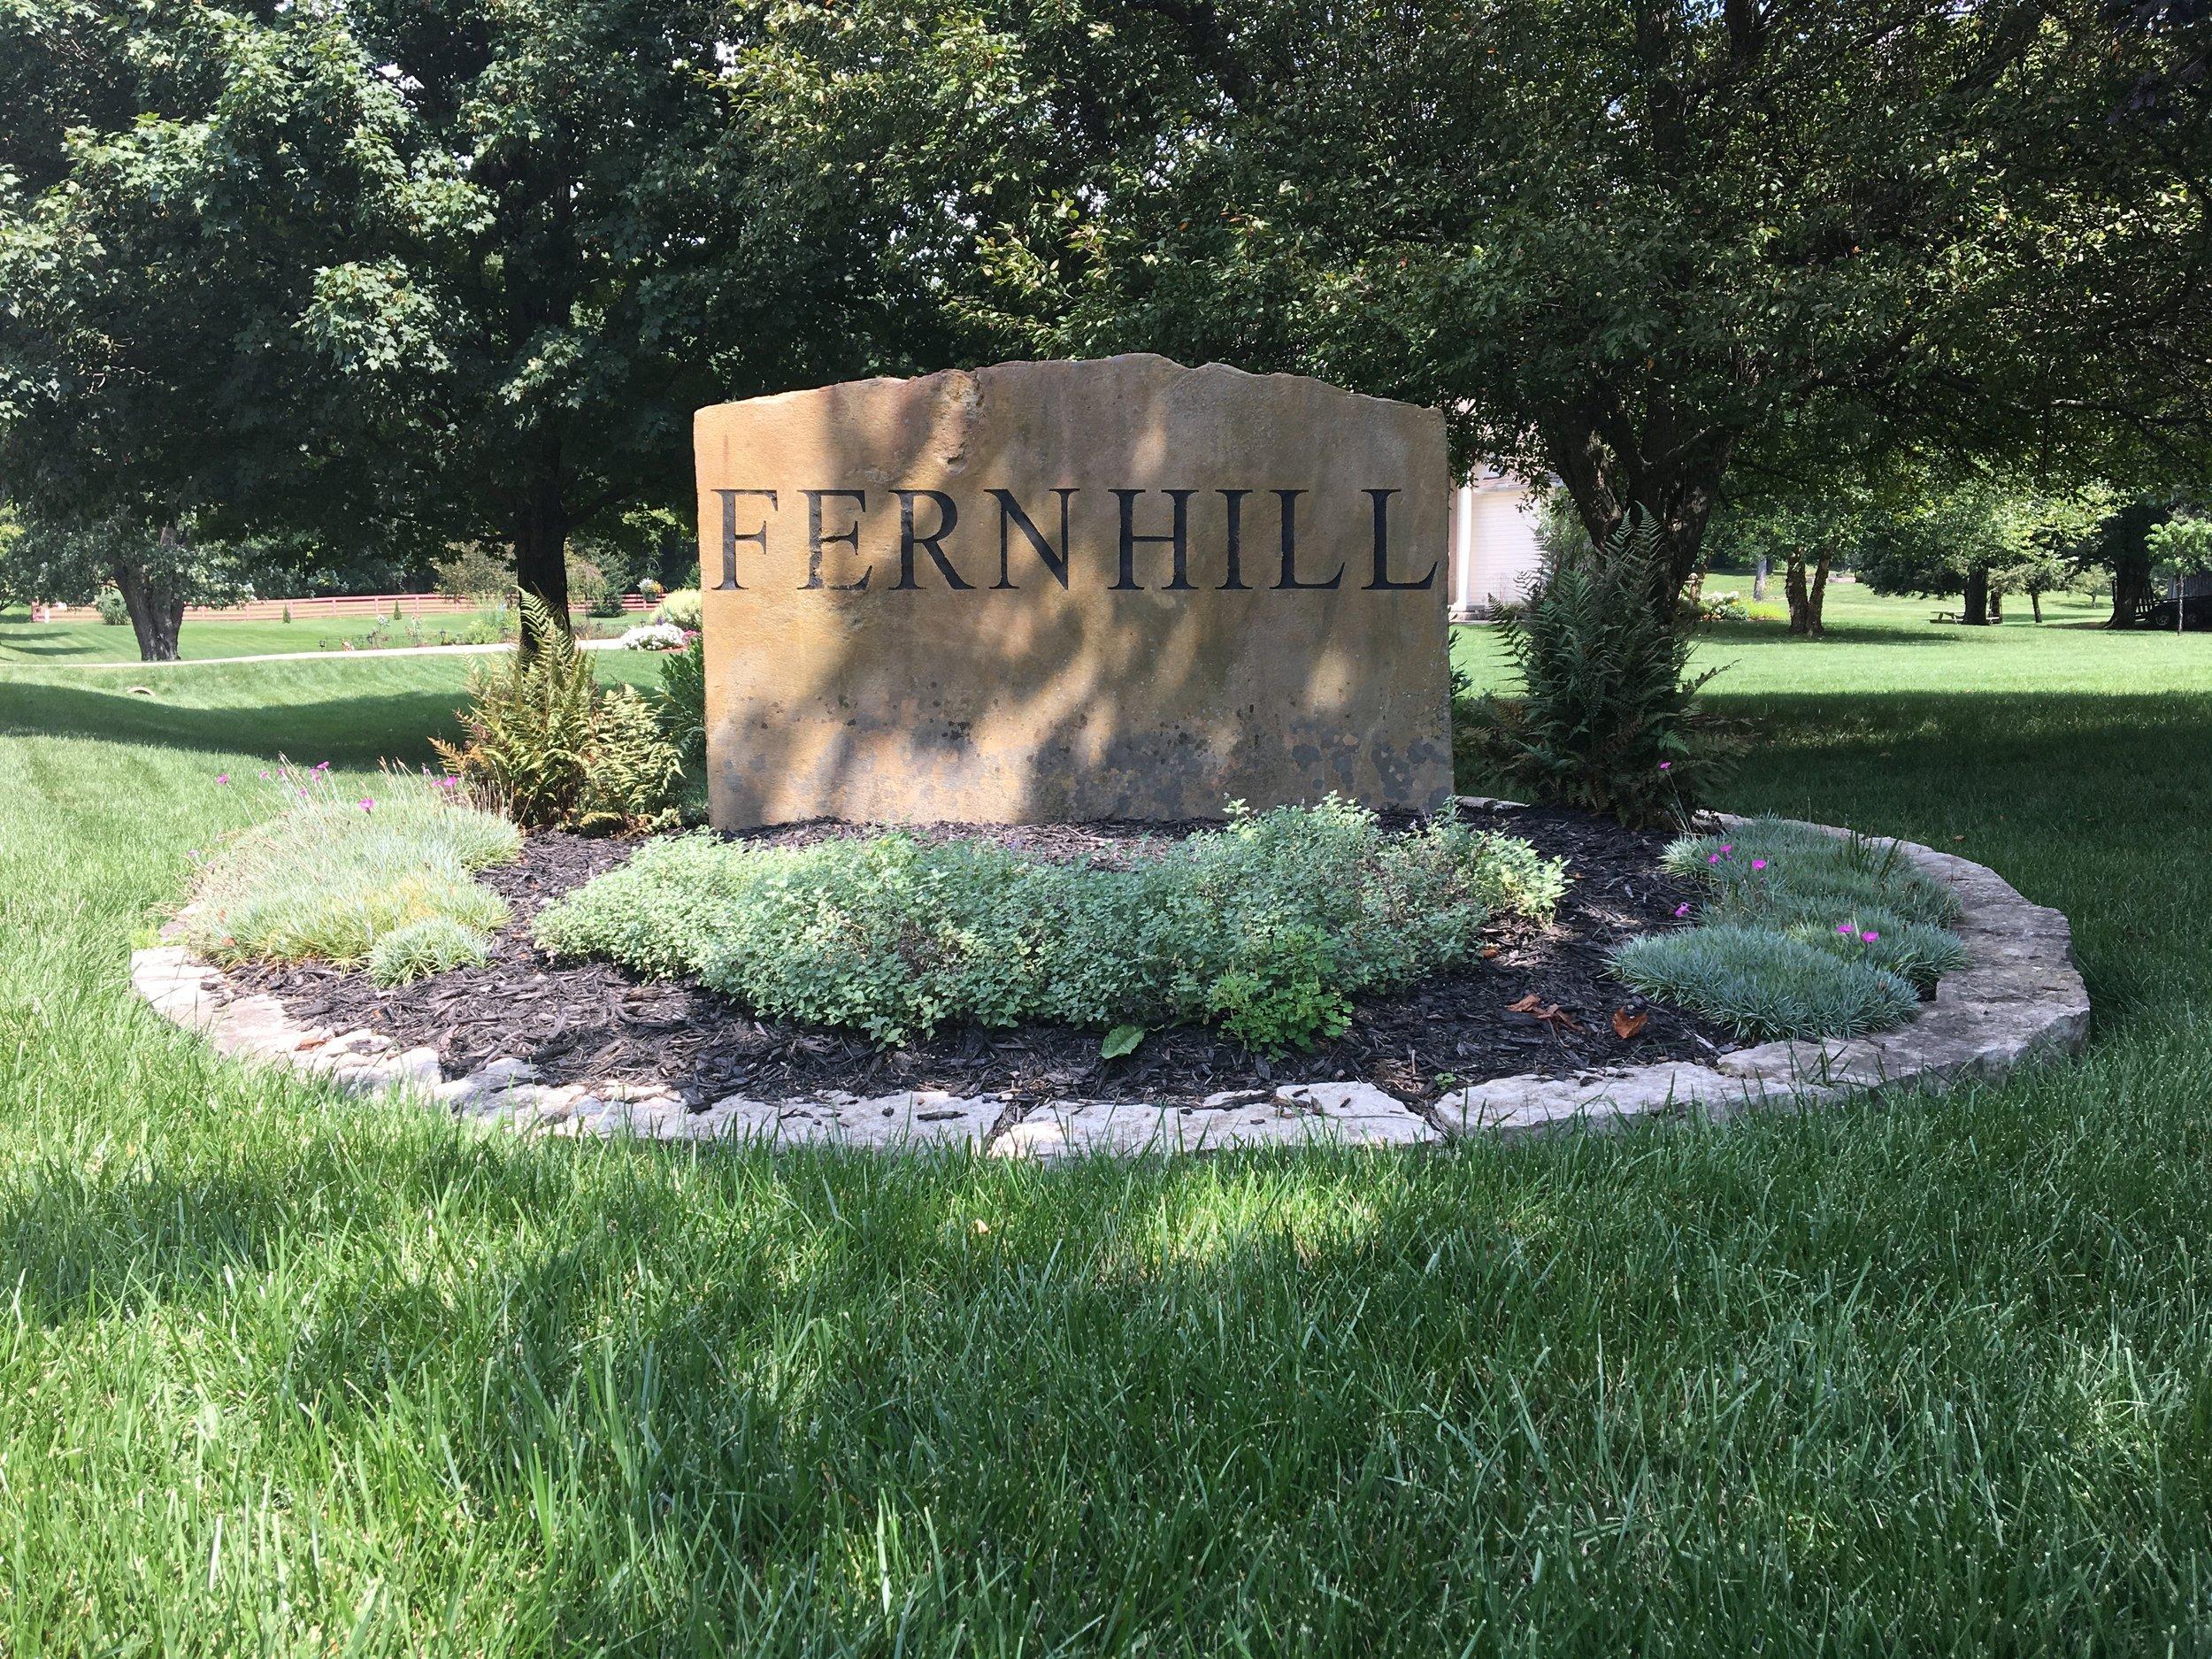 Fern hill -